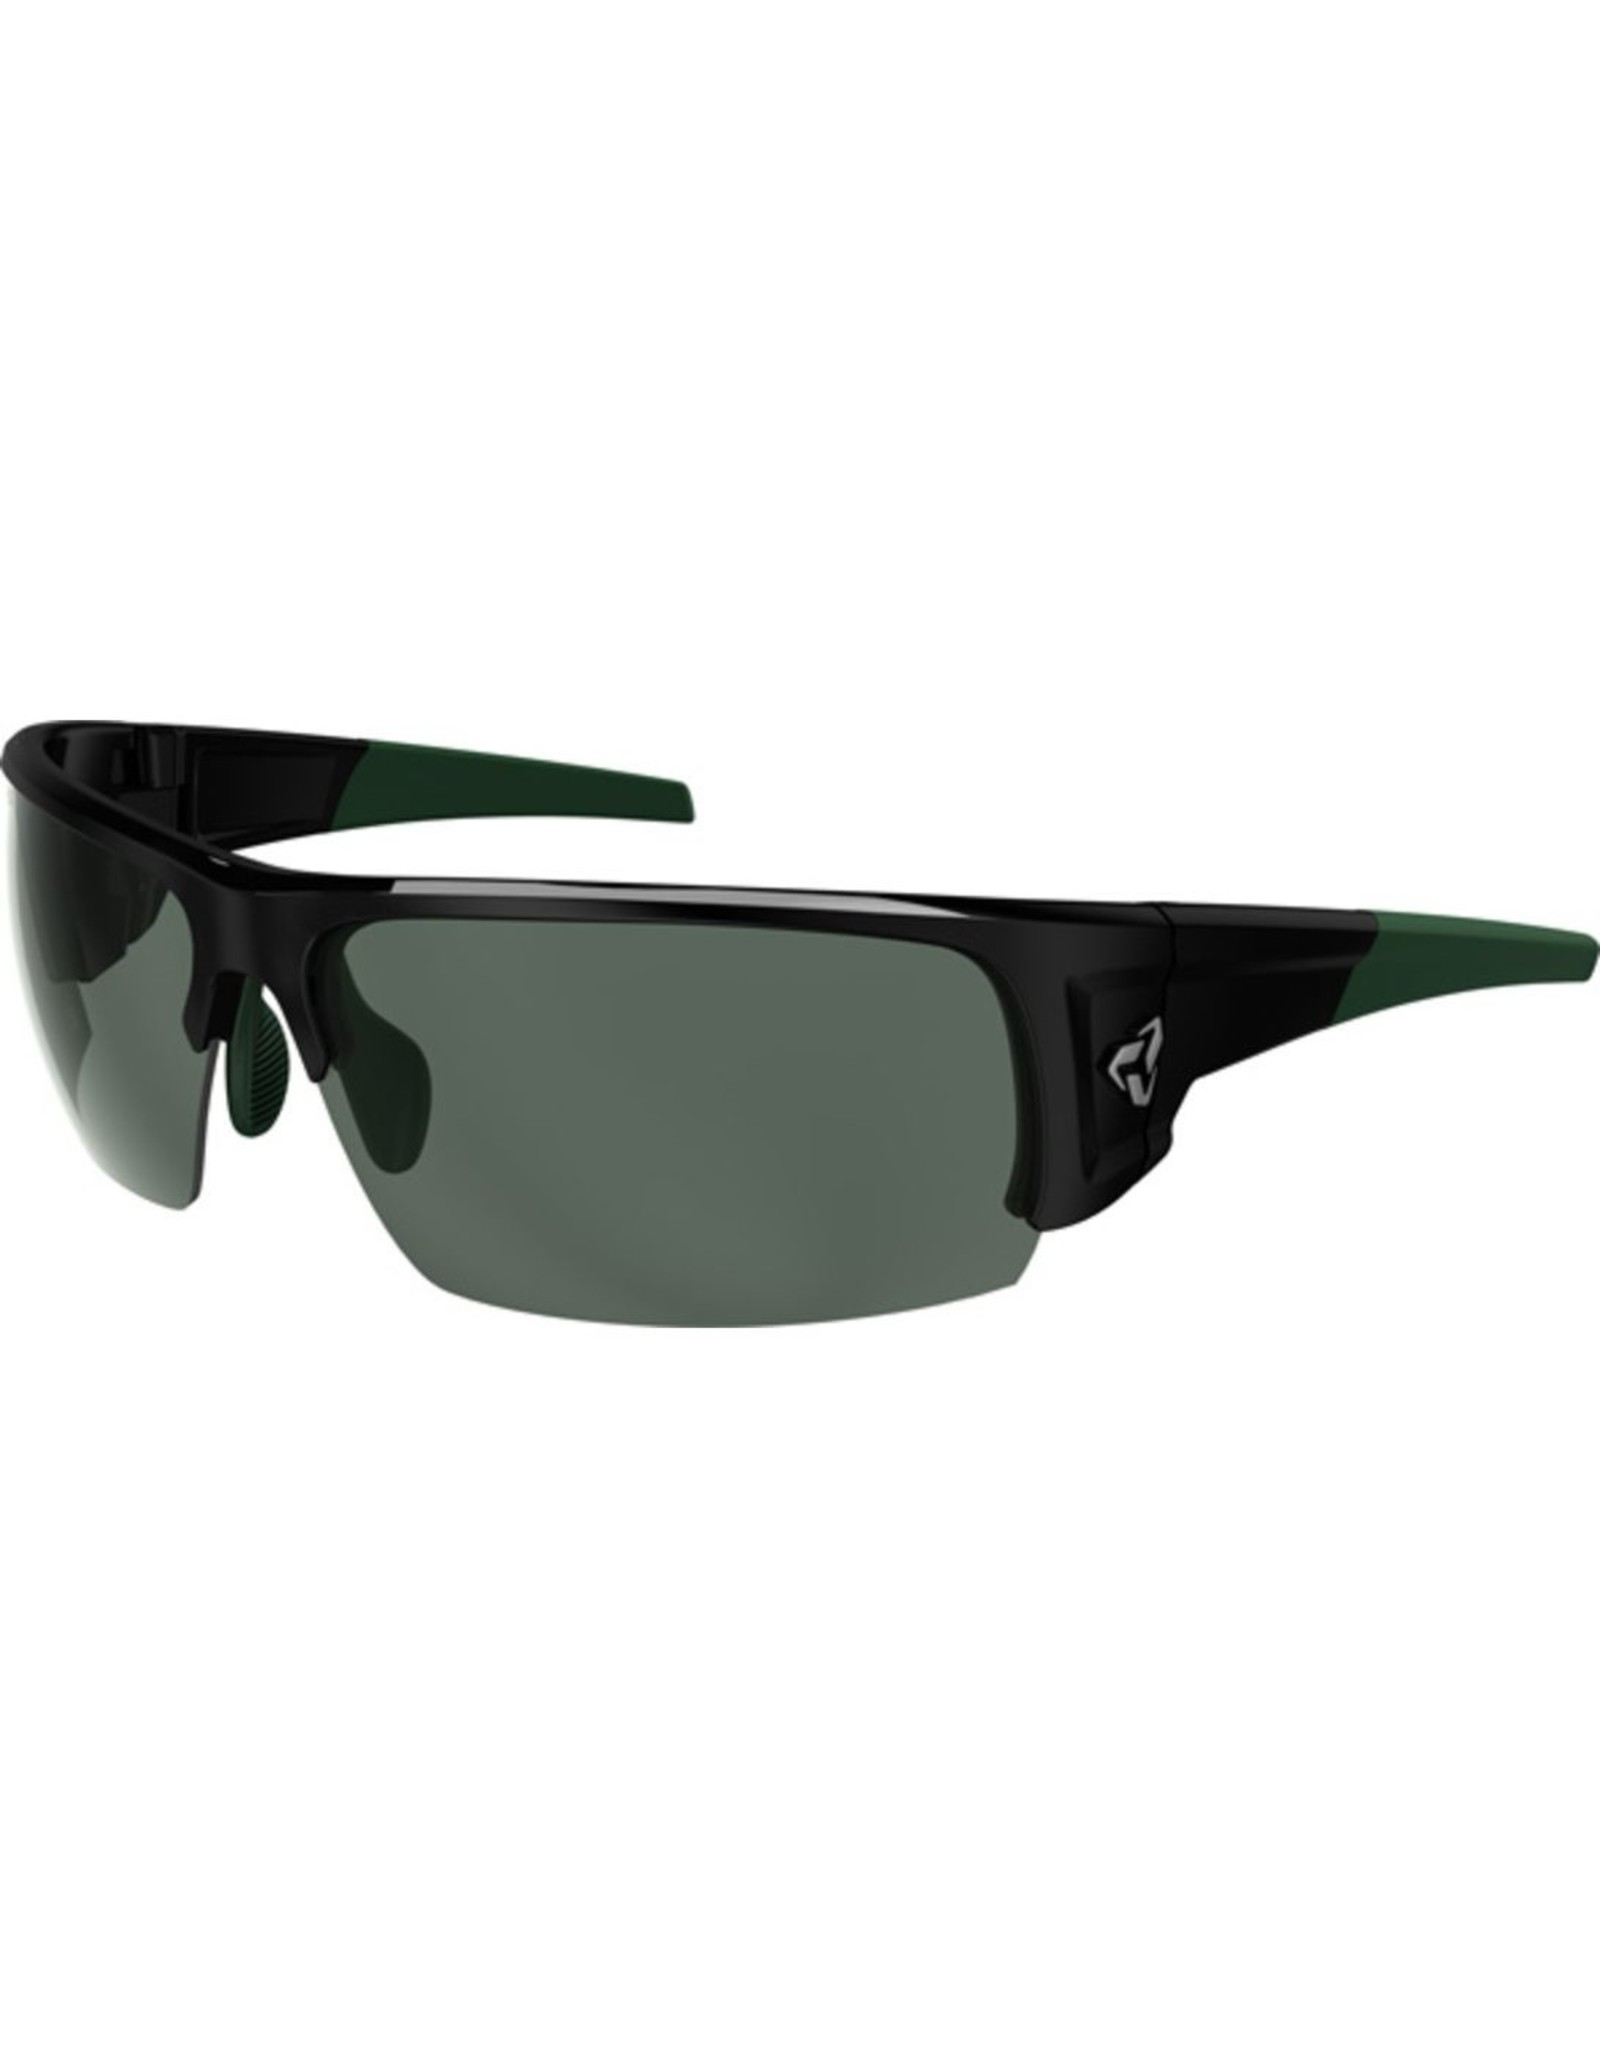 RYDERS CALIBER POLARARIZED BLACK-GREEN / GREEN LENS AR